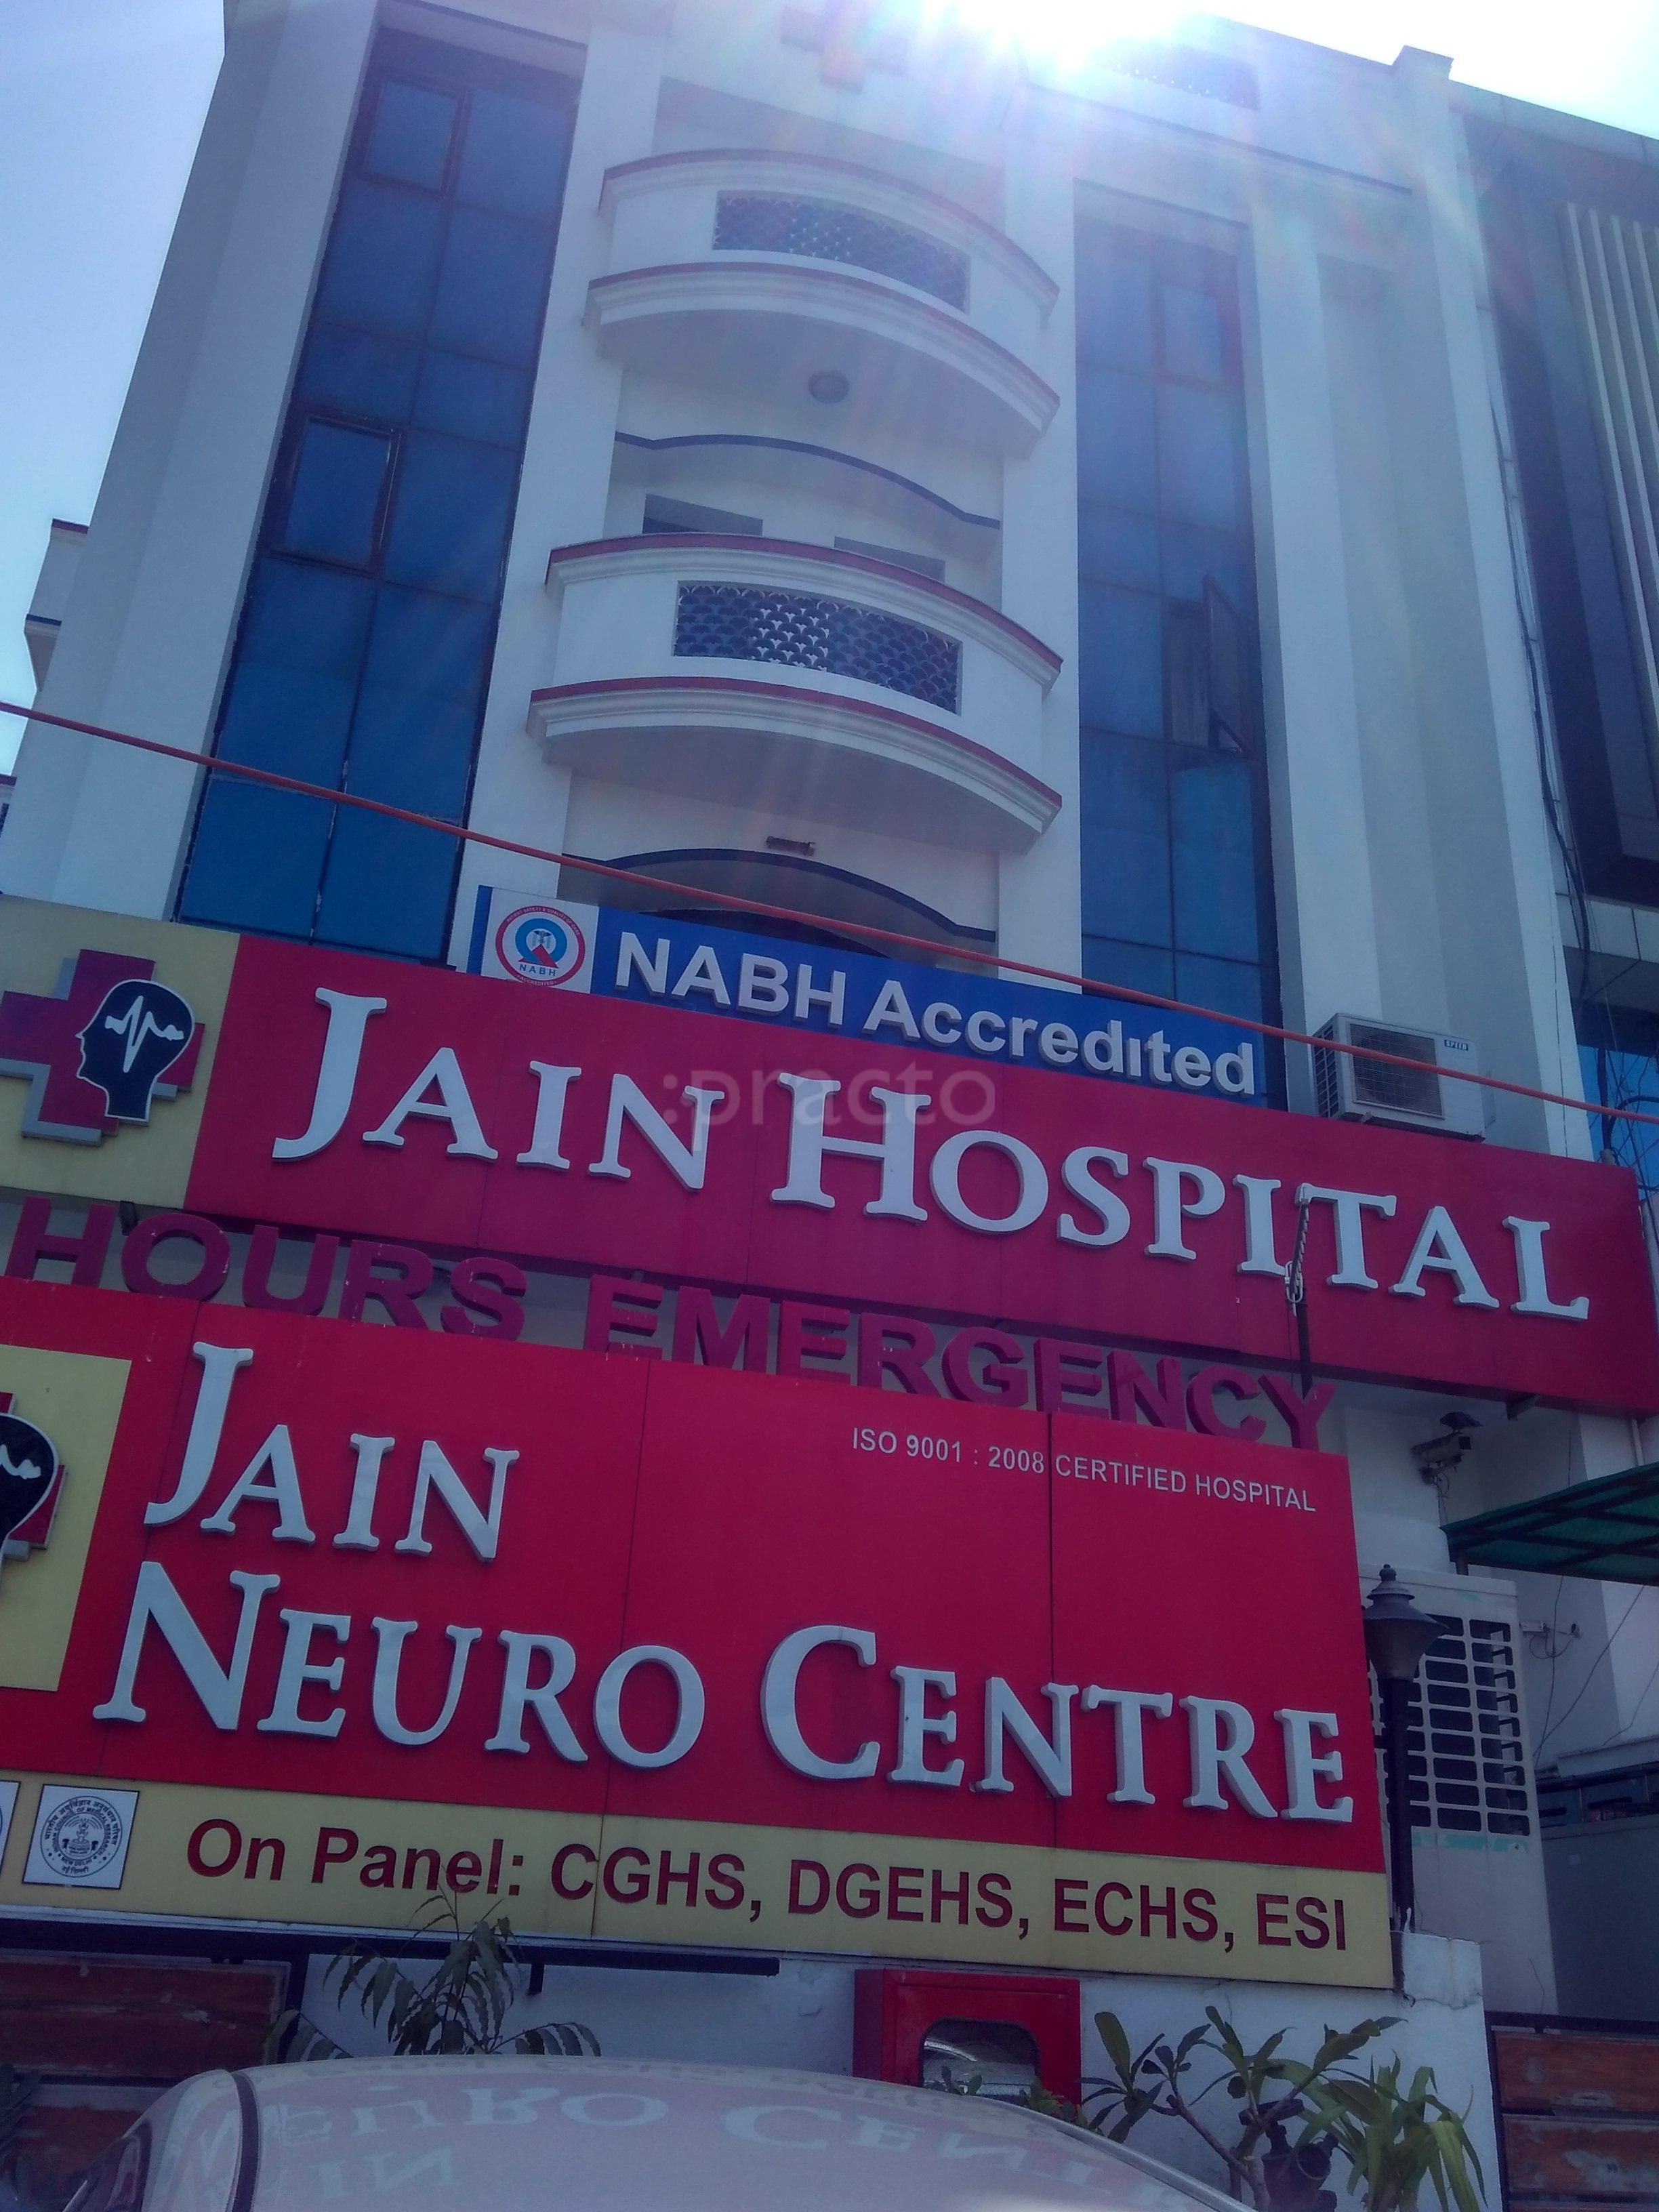 Best Hospitals in Preet Vihar, Delhi - Book Appointment, View